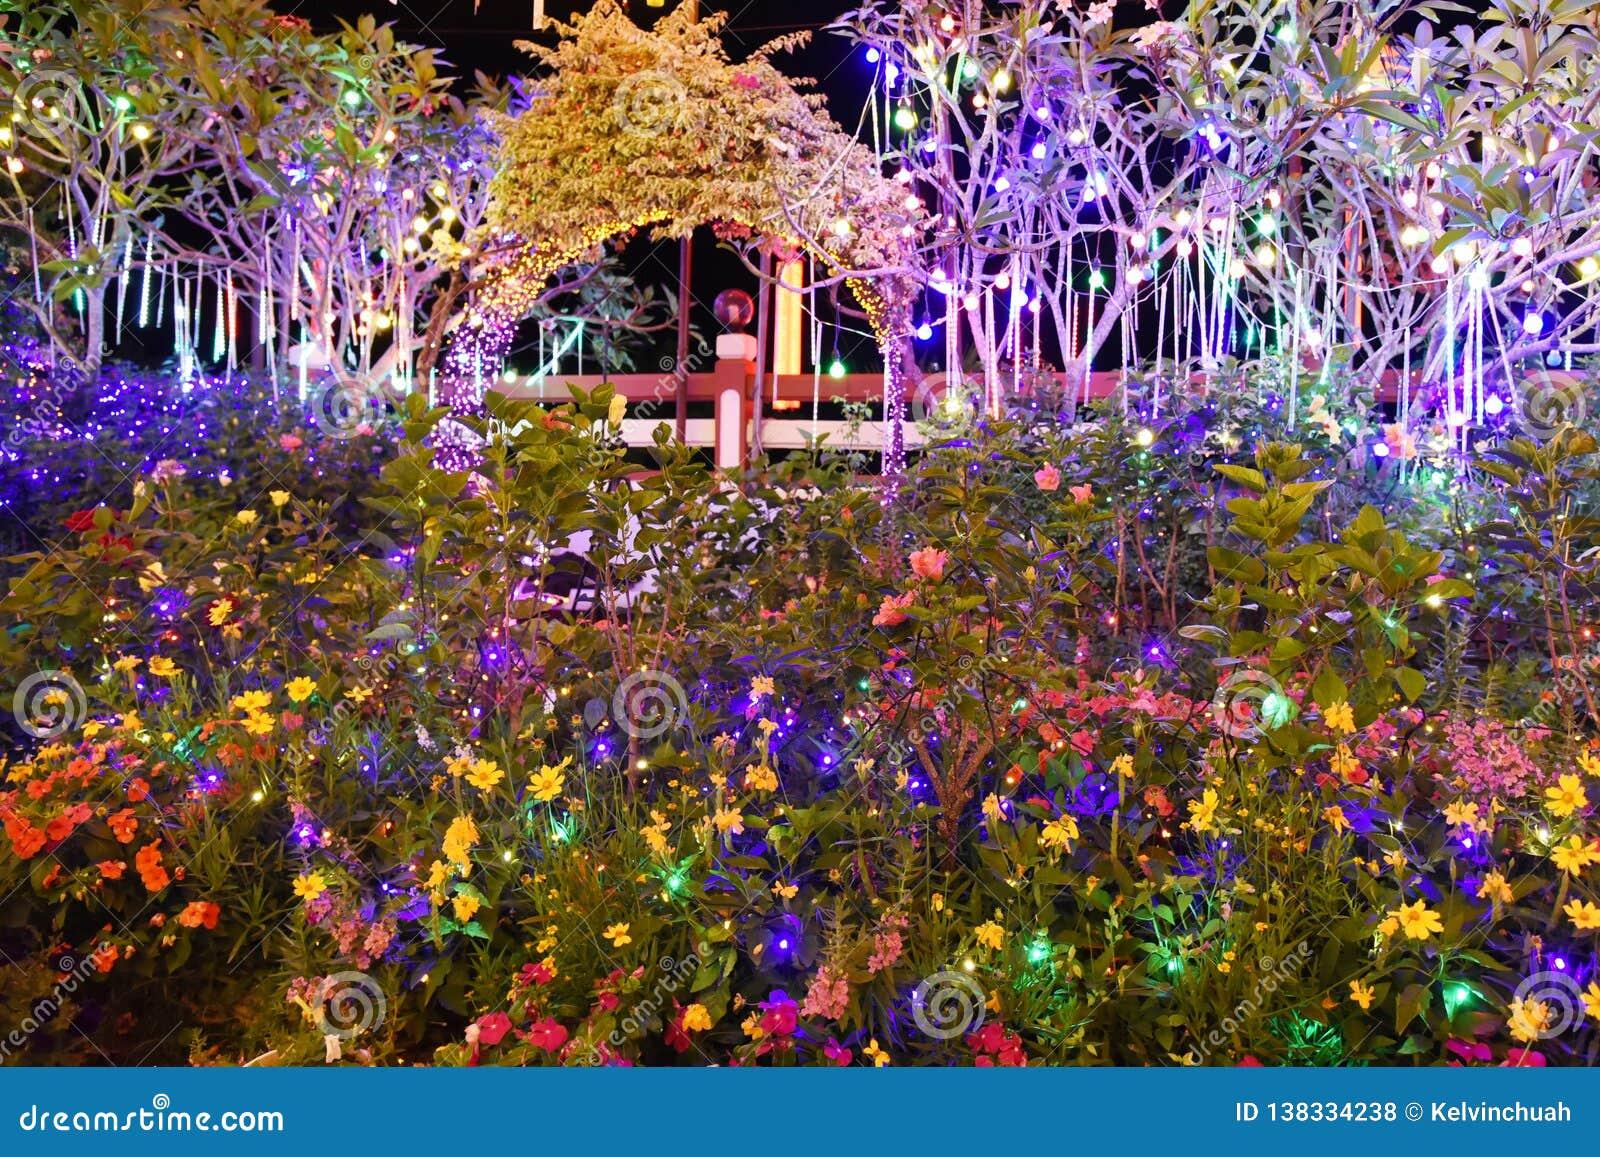 Garden Night Stock Photo Image Of Sunken Attraction 138334238